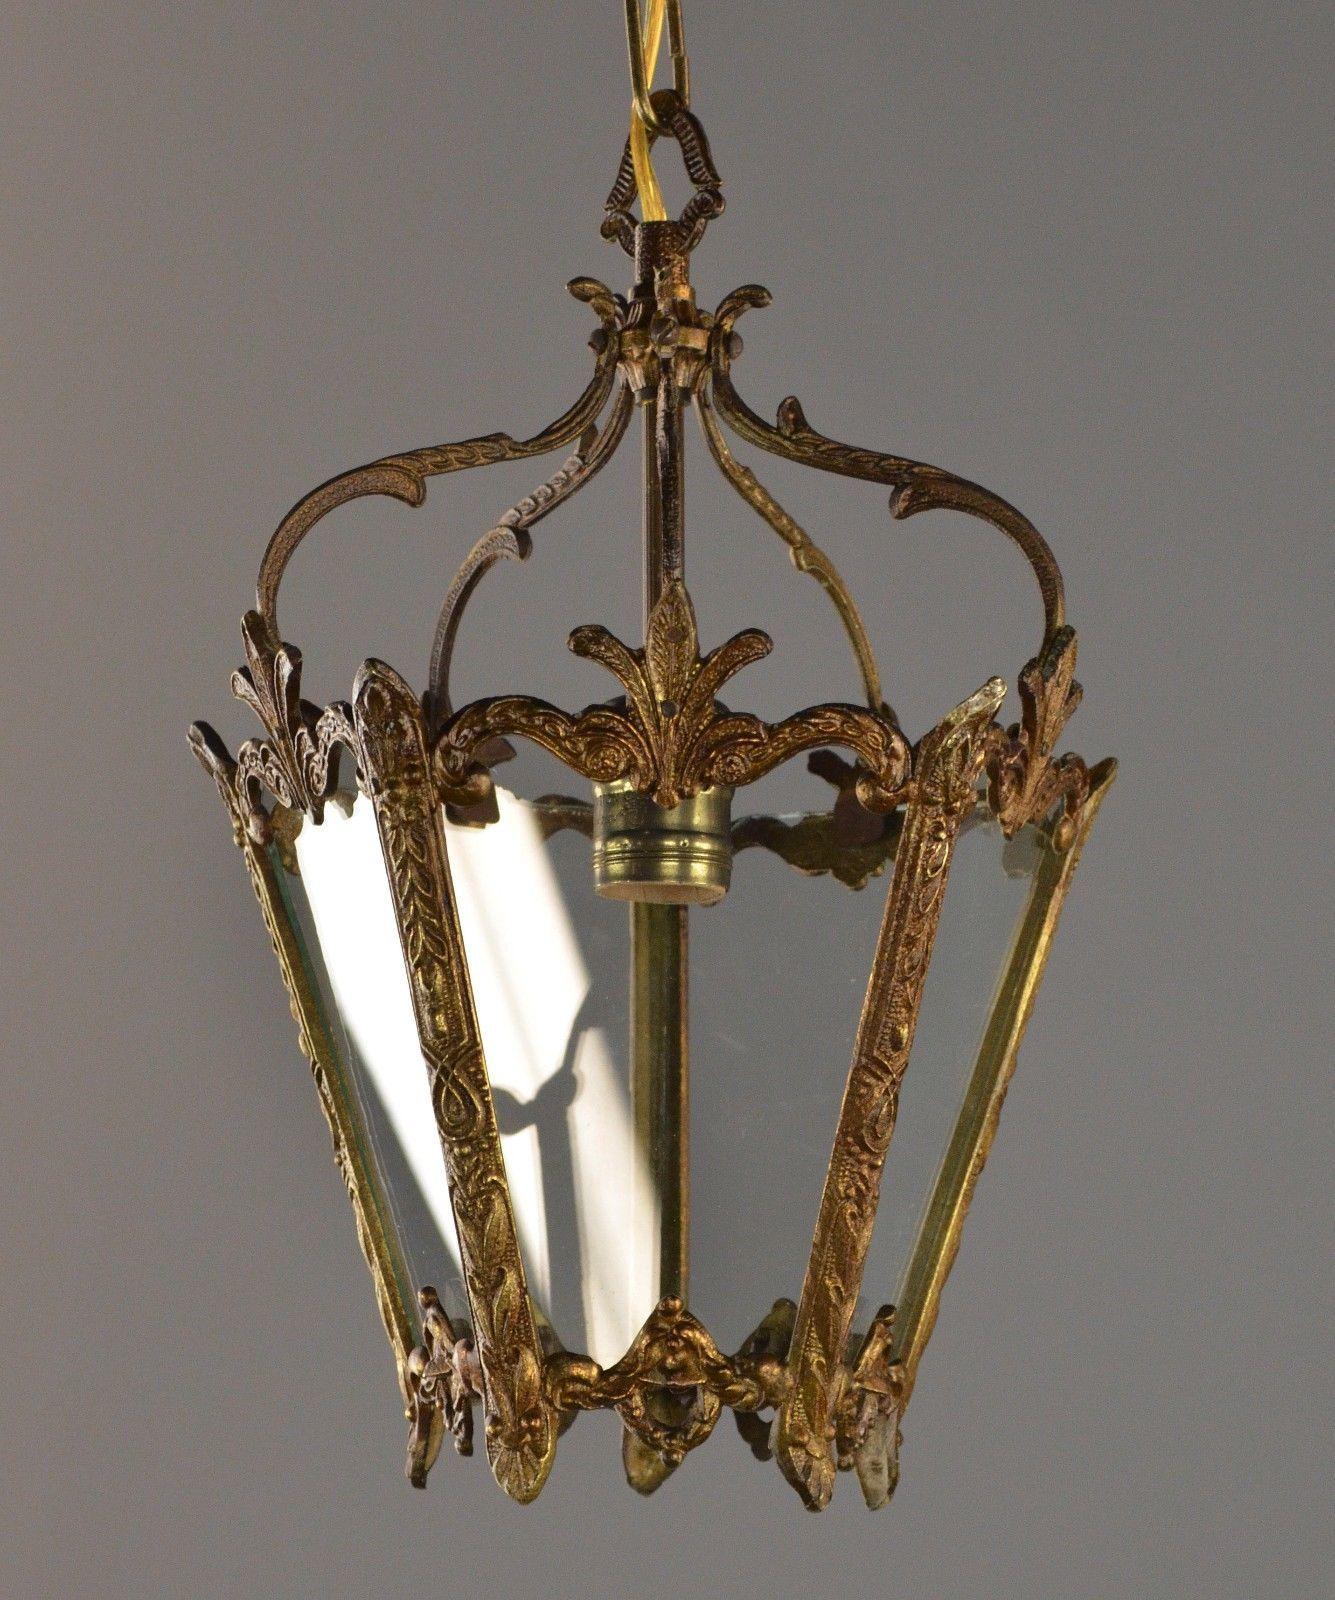 Antique Chandelier Lantern Pendant Light Restored